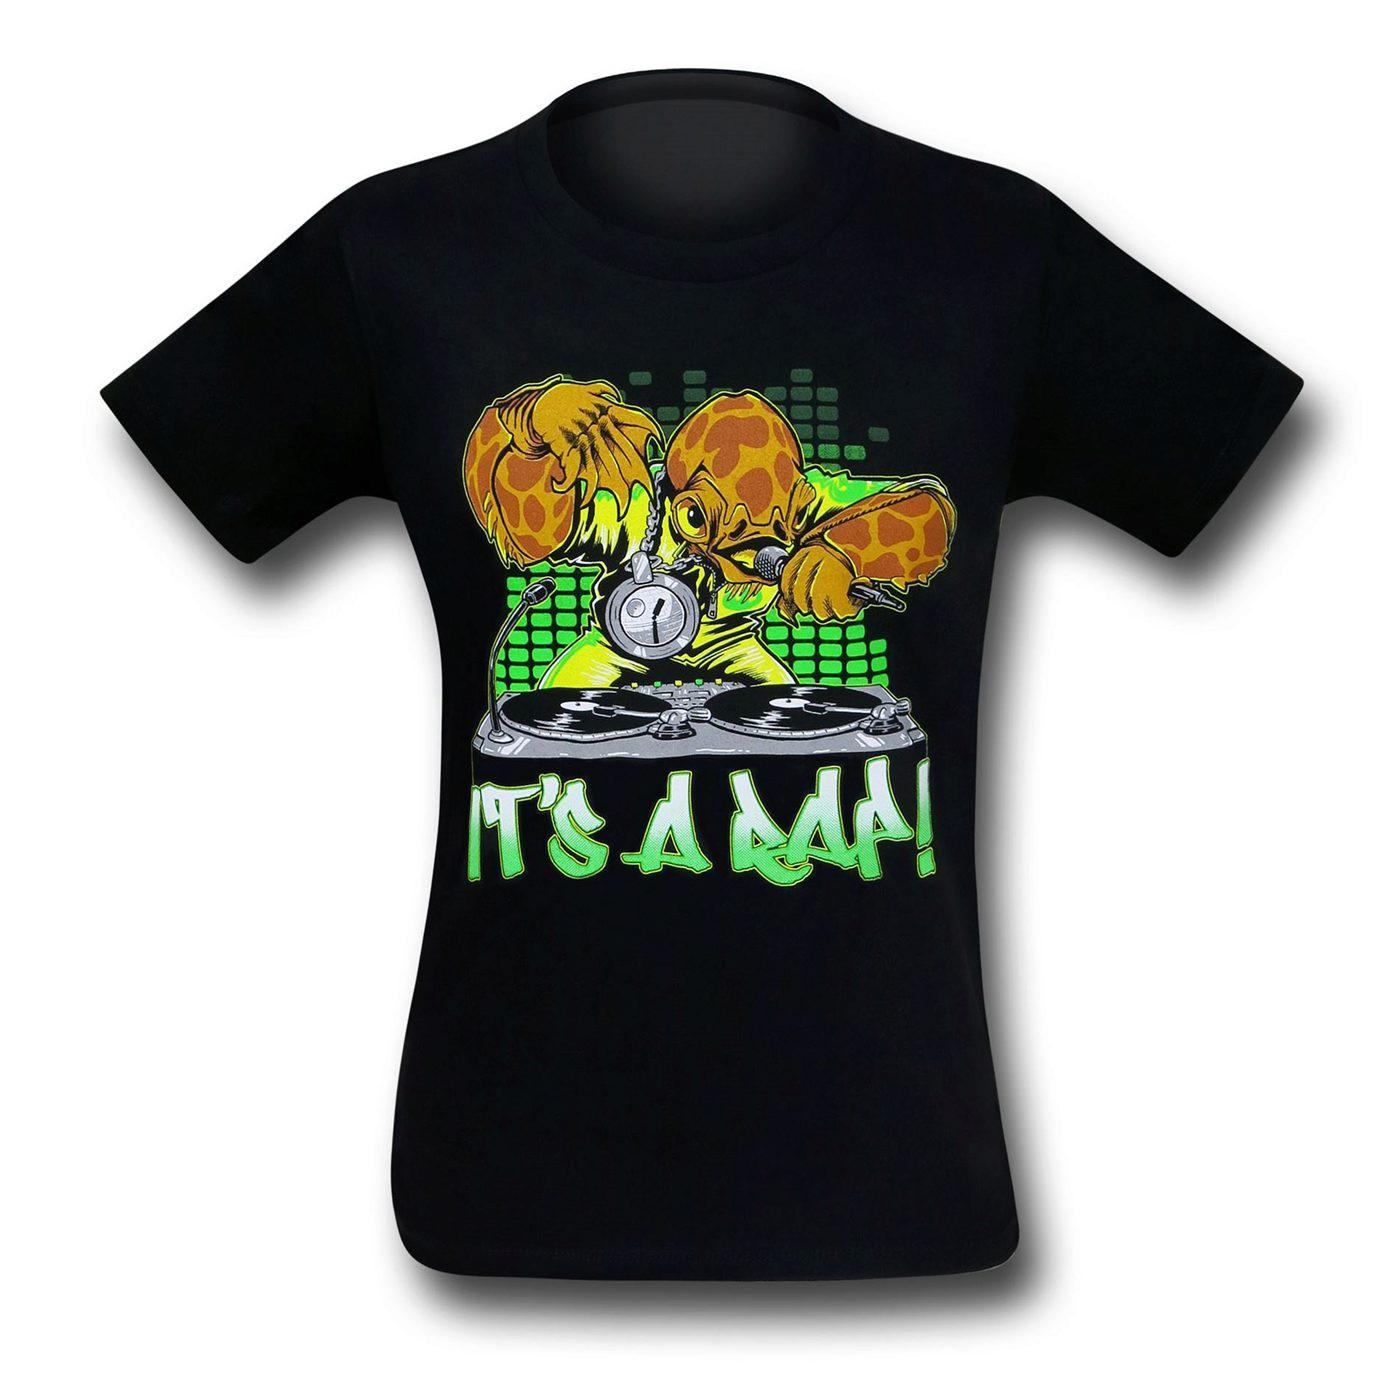 Star Wars It's a Rap 30 Single T-Shirt